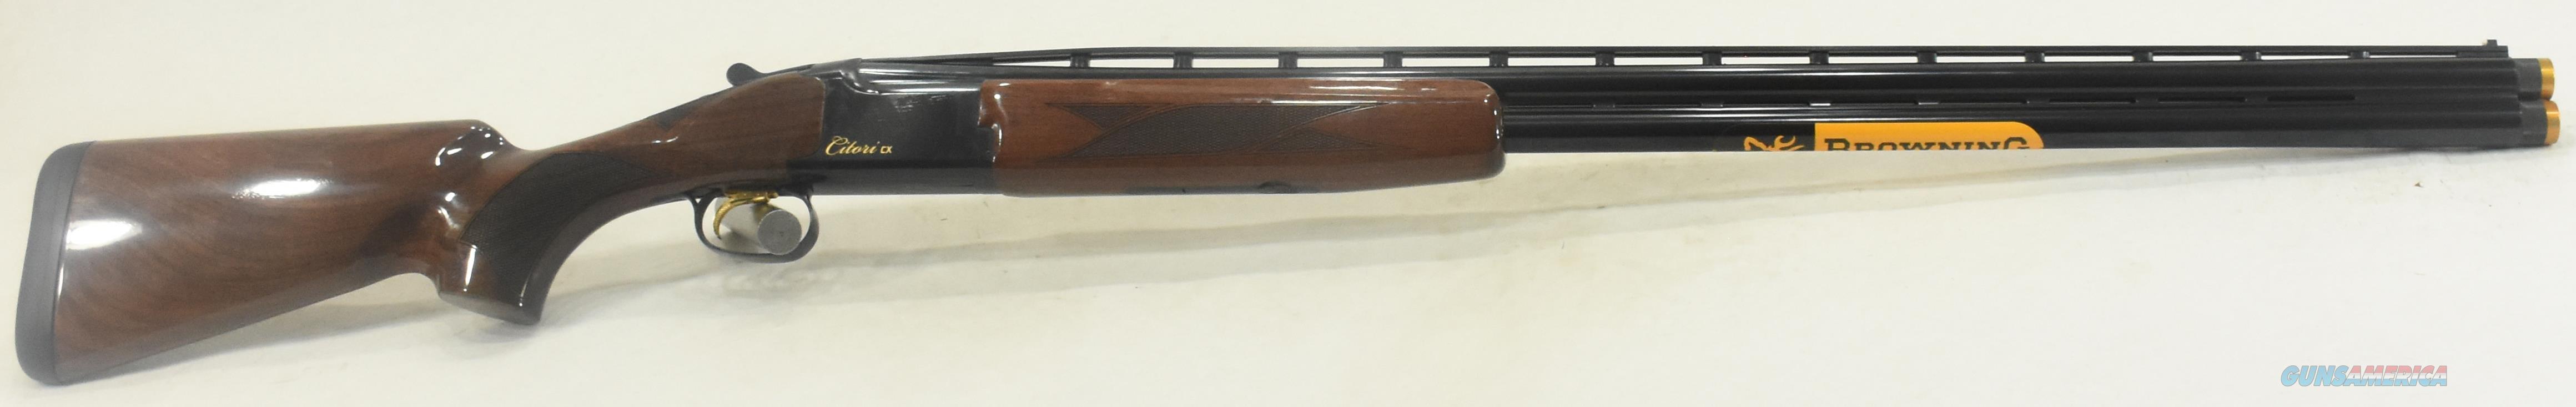 Citori CX Walnut 12Ga 32-3In 018115302  Guns > Shotguns > Browning Shotguns > Over Unders > Citori > Hunting